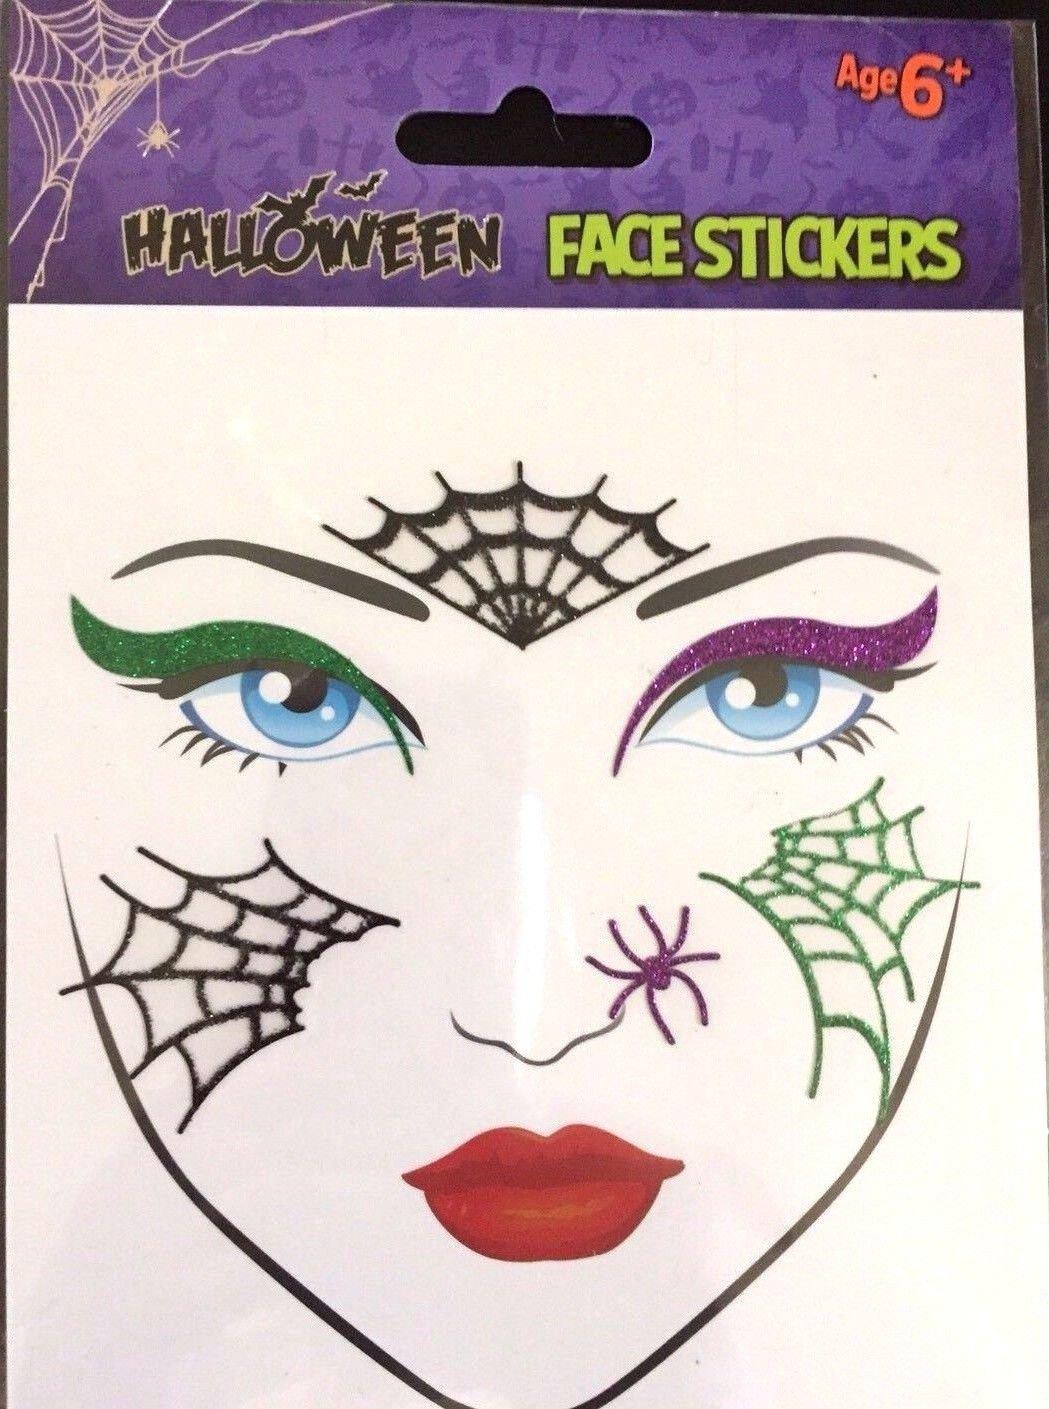 Halloween Glitter Face Tattoo Stickers Creepy Temporary Body Art Festival Fun Make up Dressing up Carnival- Halloween Latest Must have Accessory (Design 1 - Webs) TJM LTD